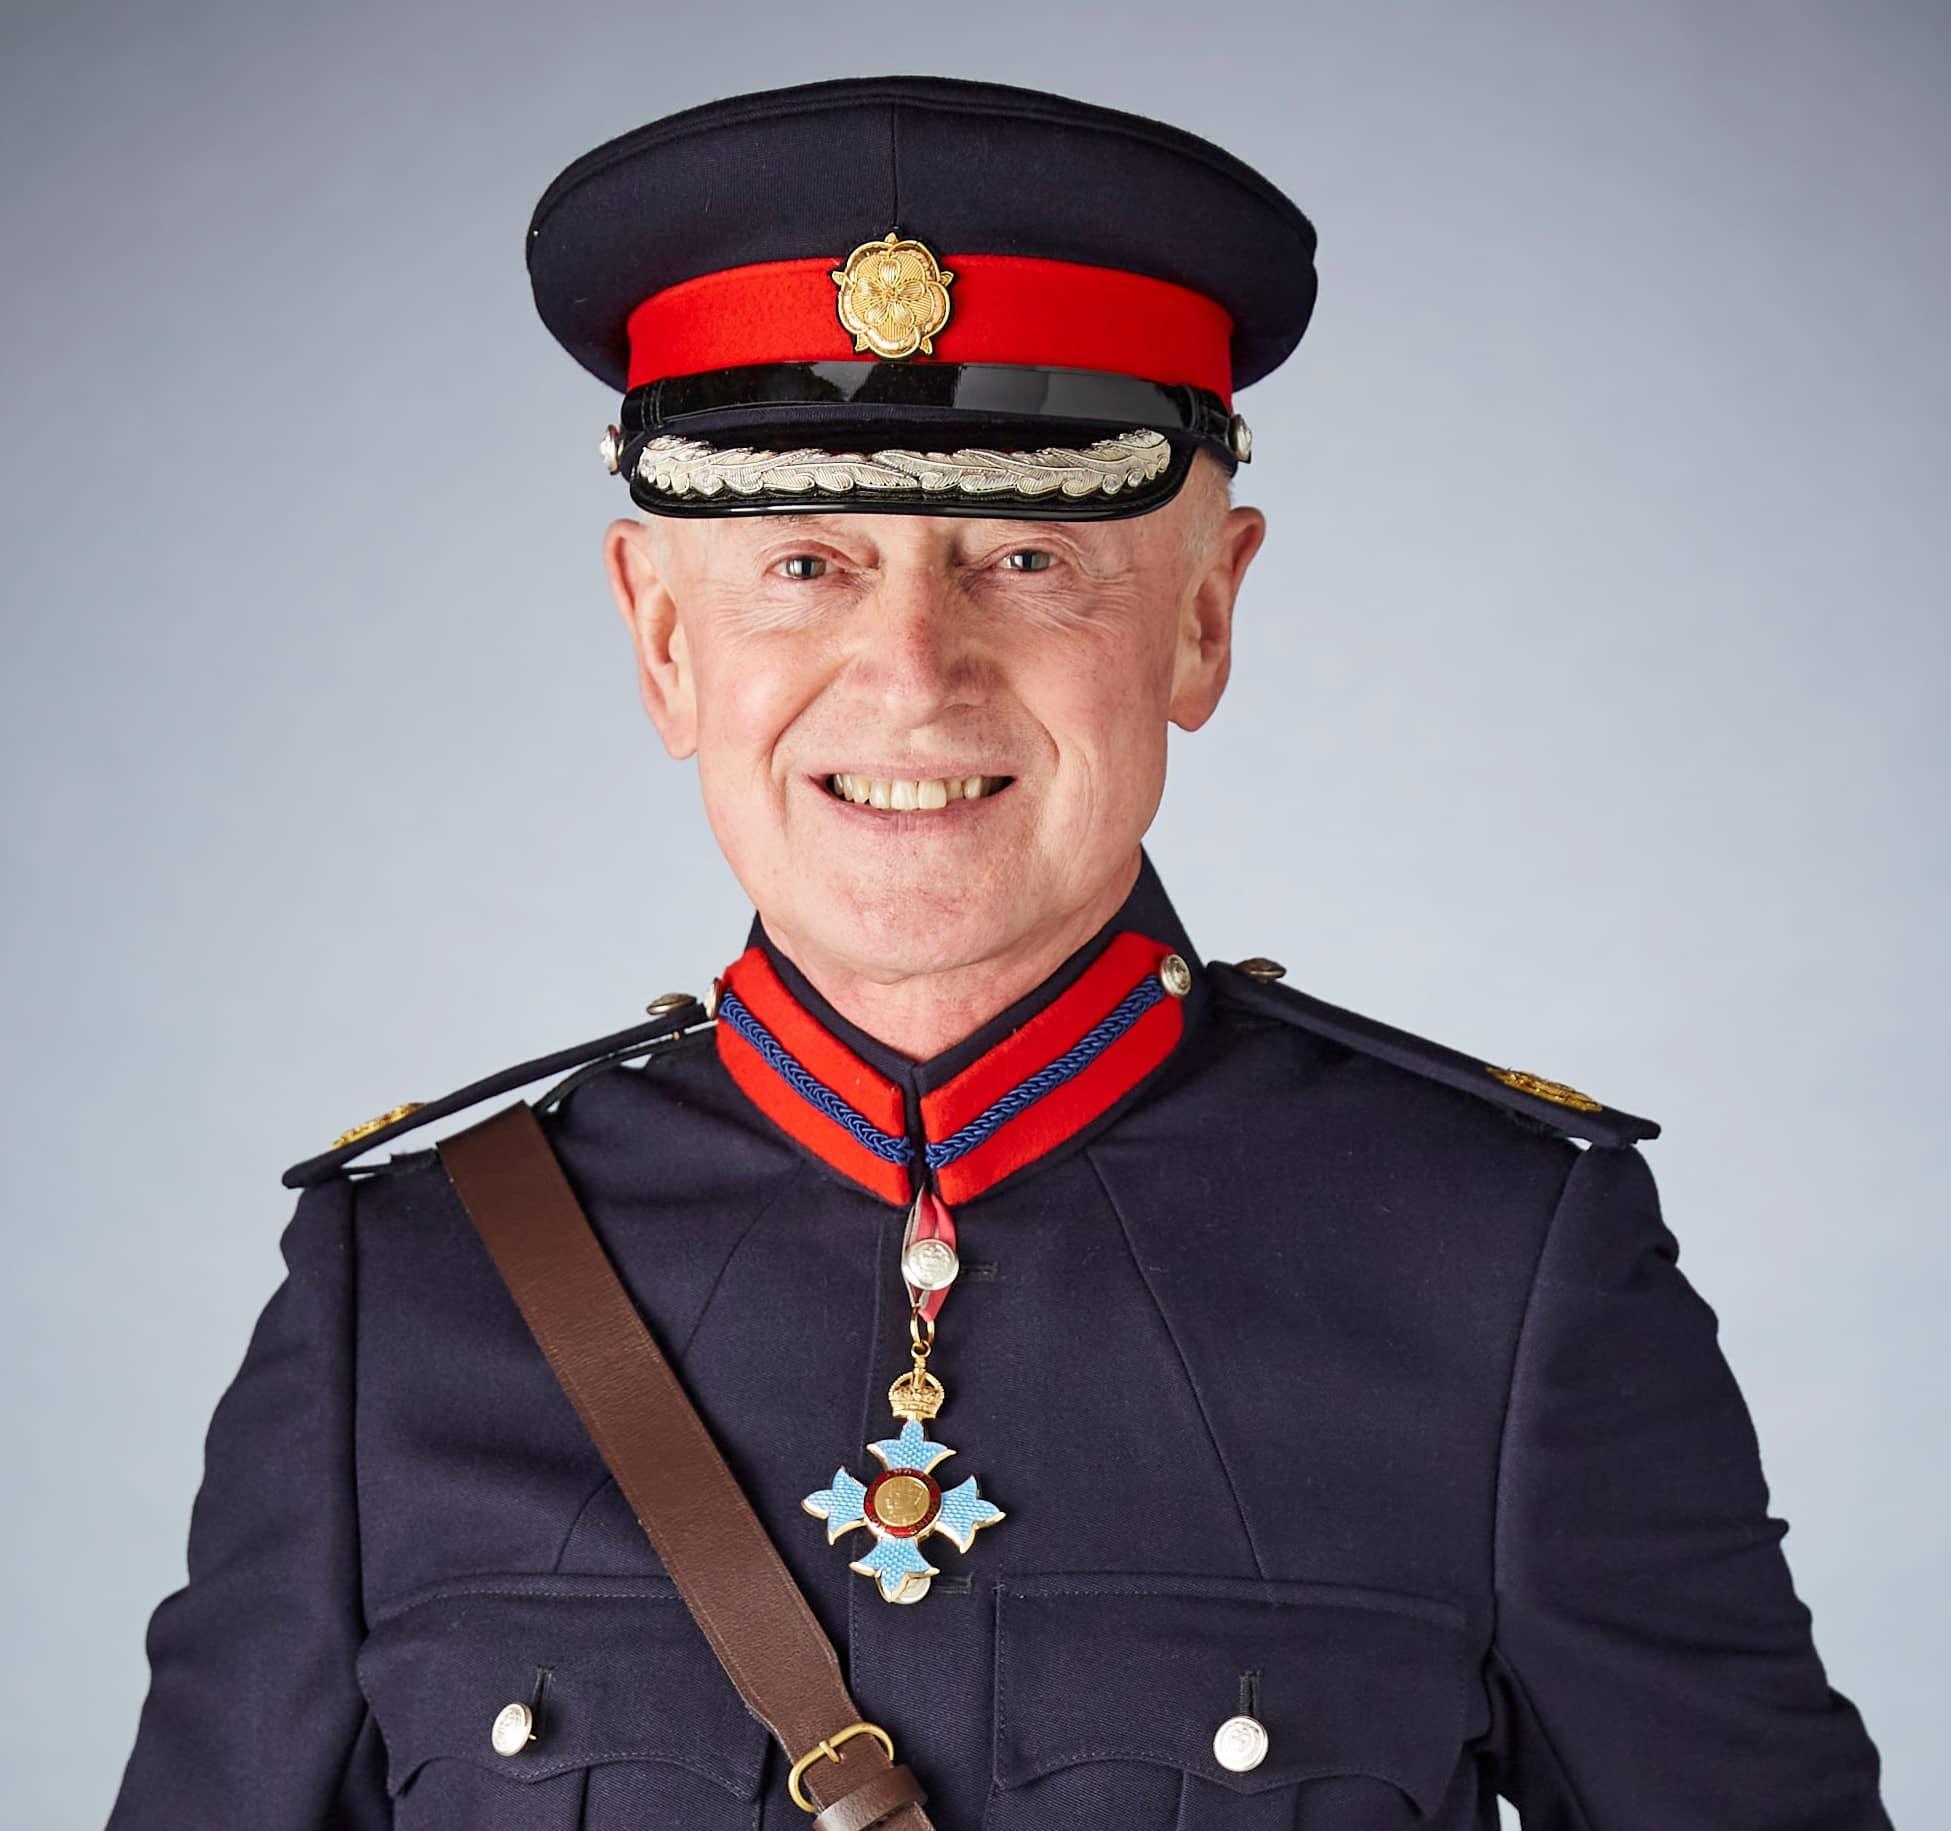 Edwin Booth High Sheriff of Lancashire